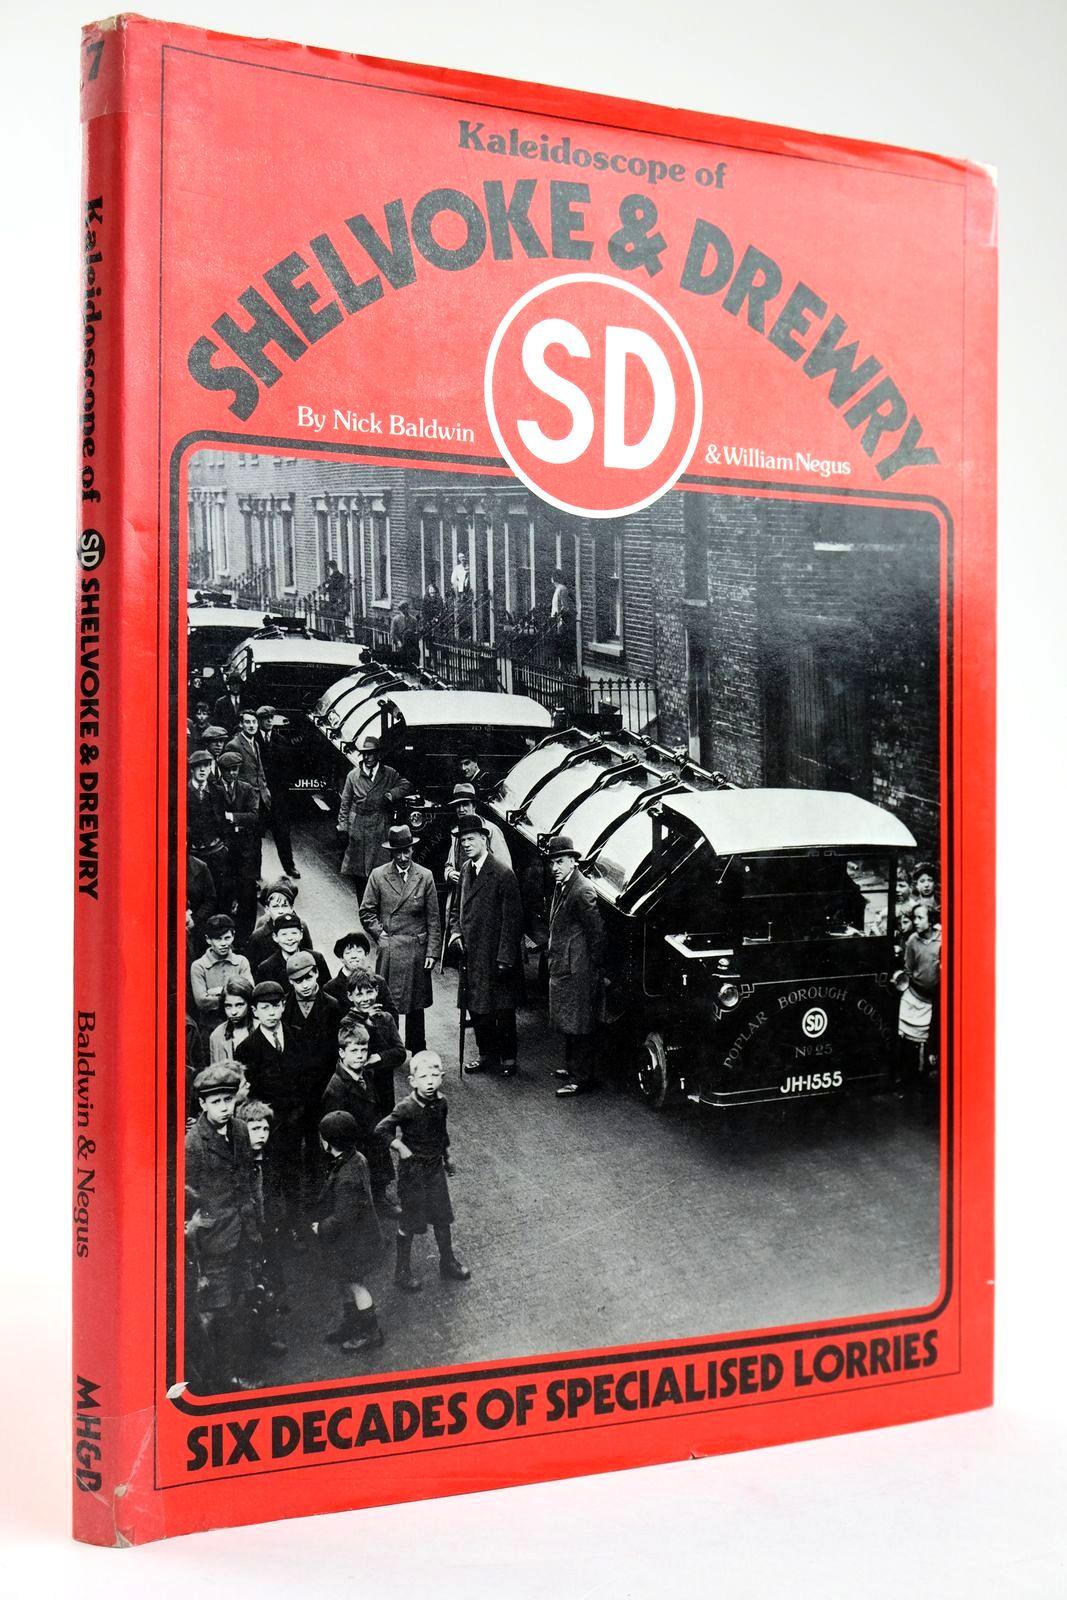 Photo of A KALEIDOSCOPE OF SHELVOKE & DREWRY- Stock Number: 2133551